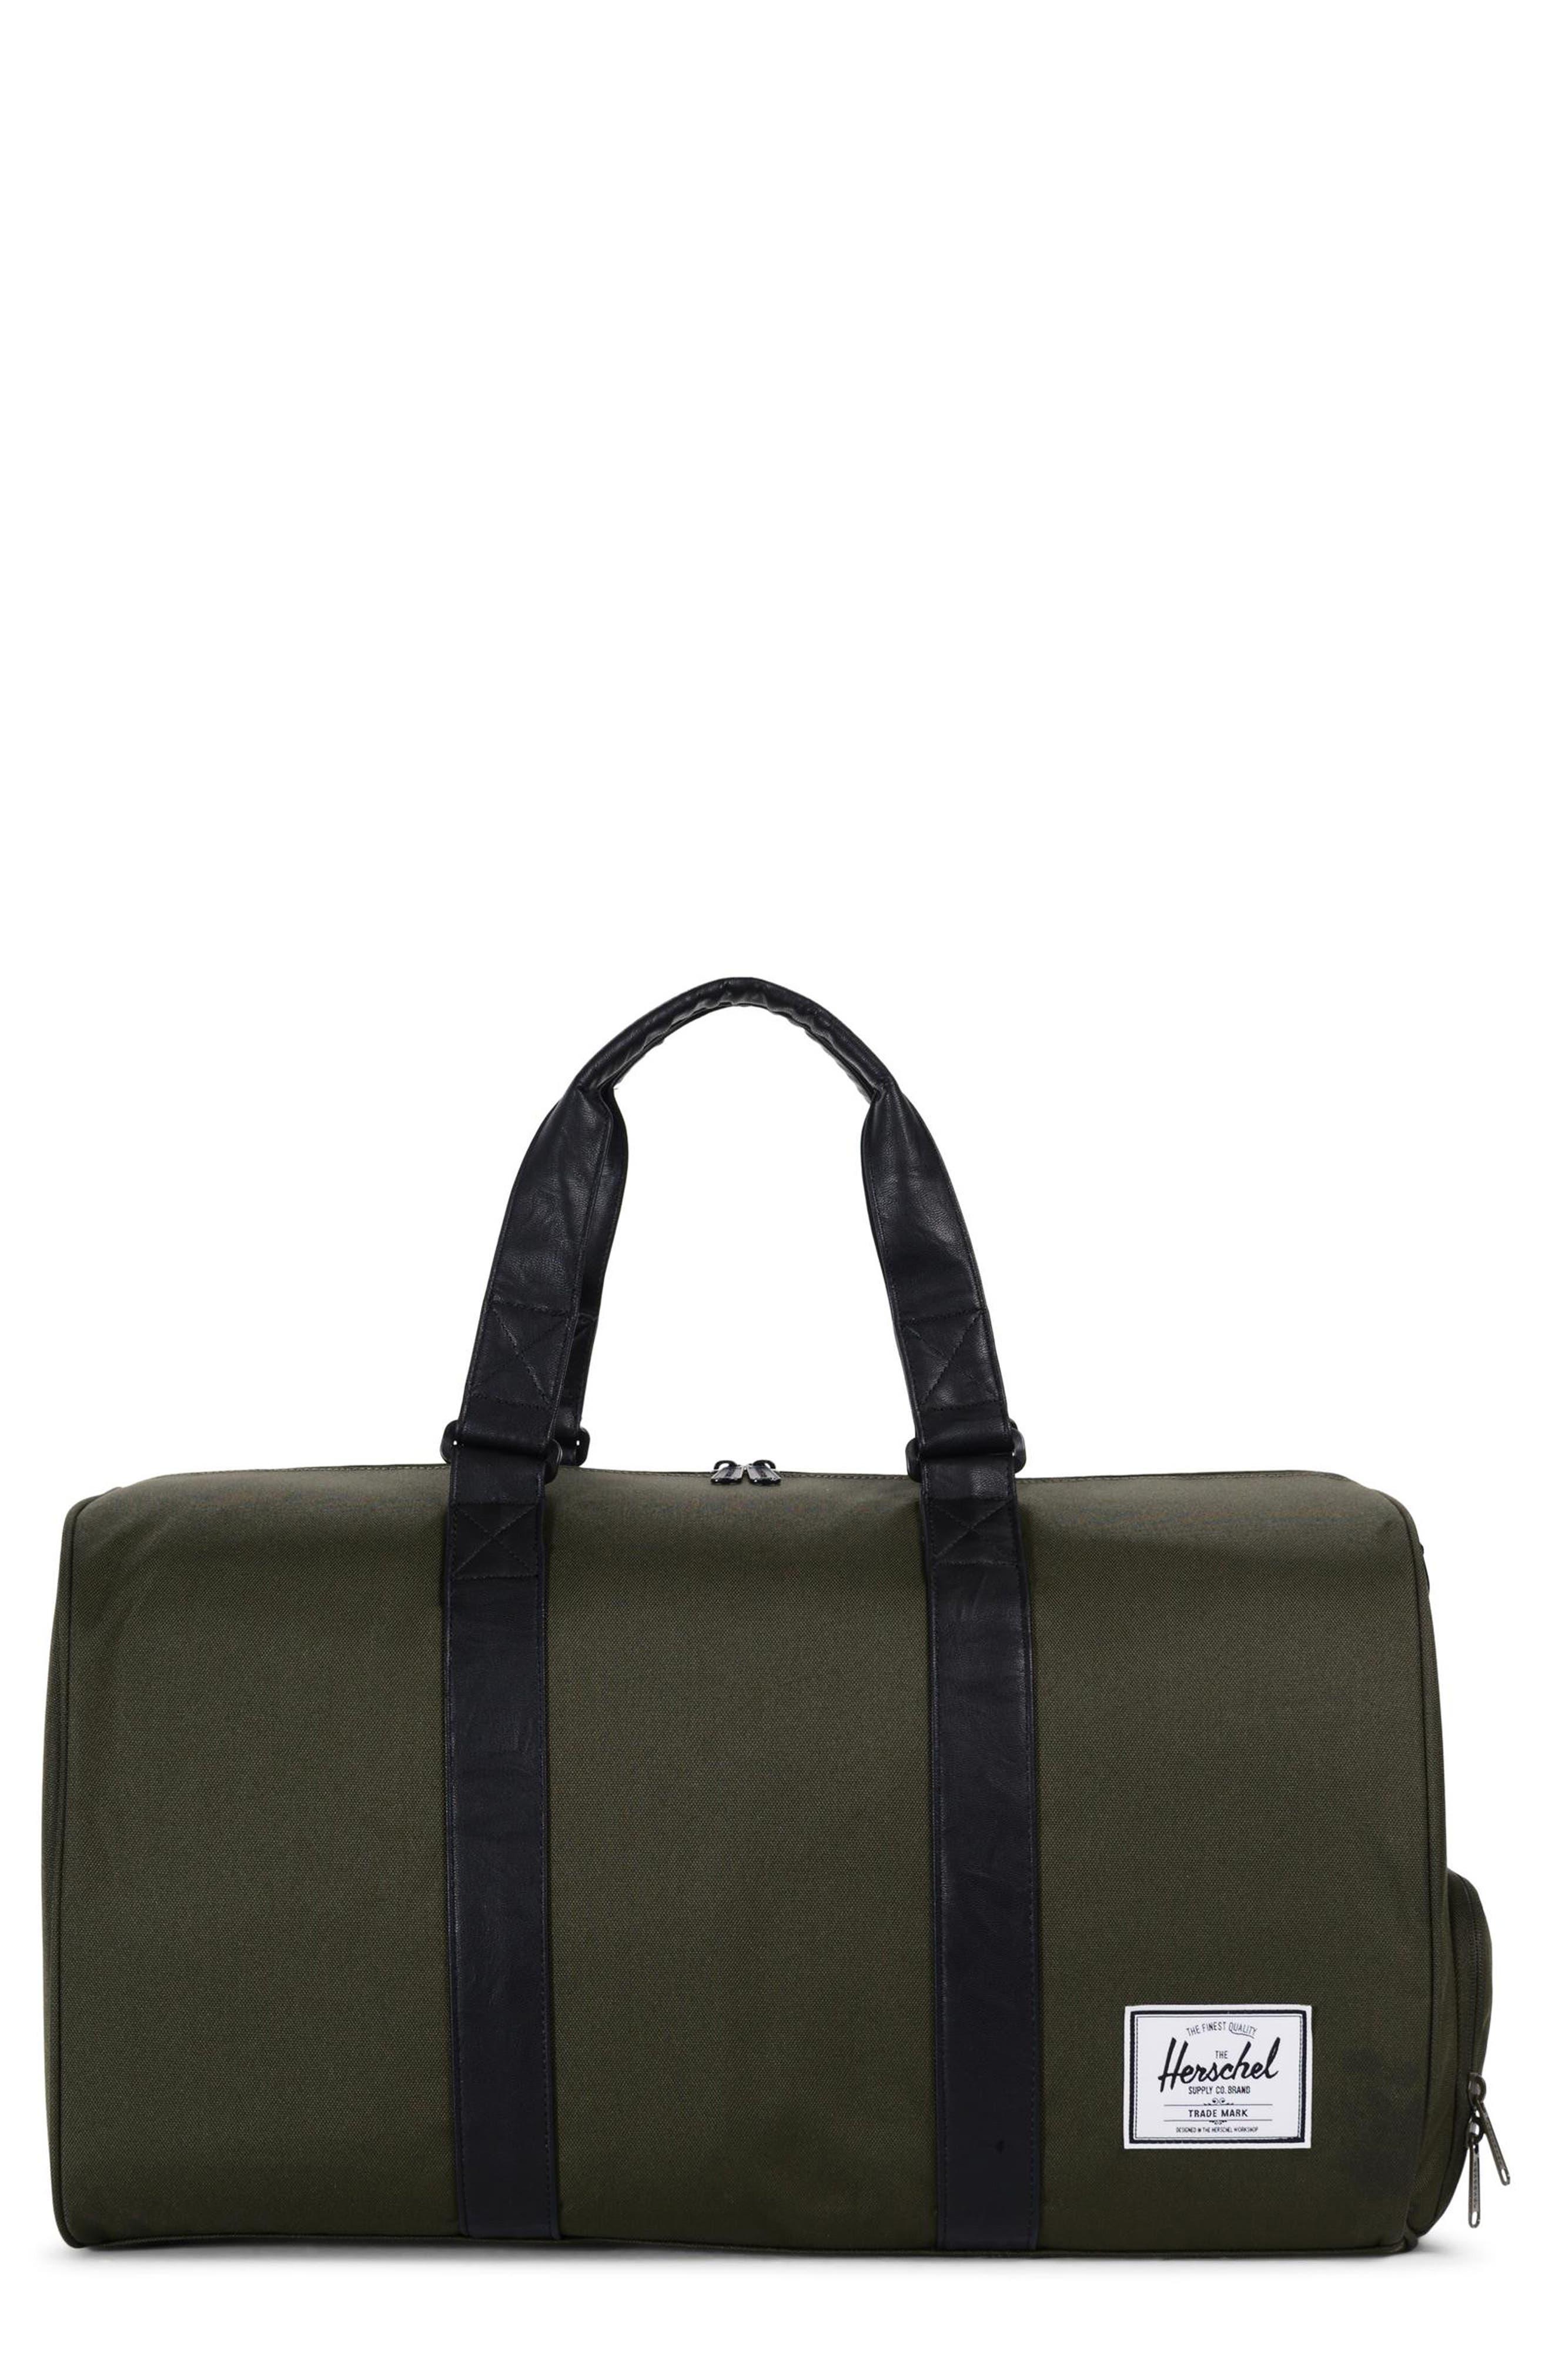 HERSCHEL SUPPLY CO. 'Novel' Duffel Bag, Main, color, 300